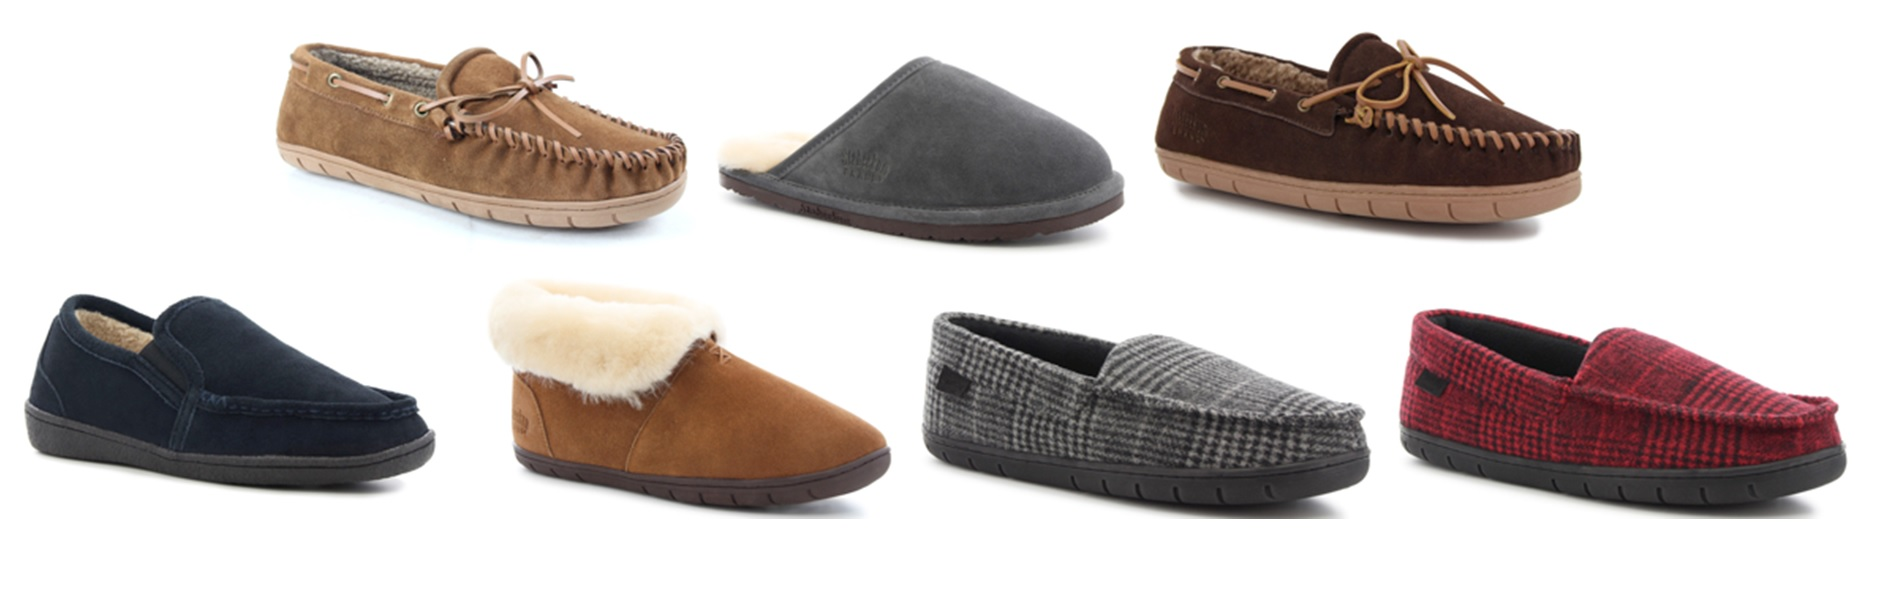 Valentines slippers